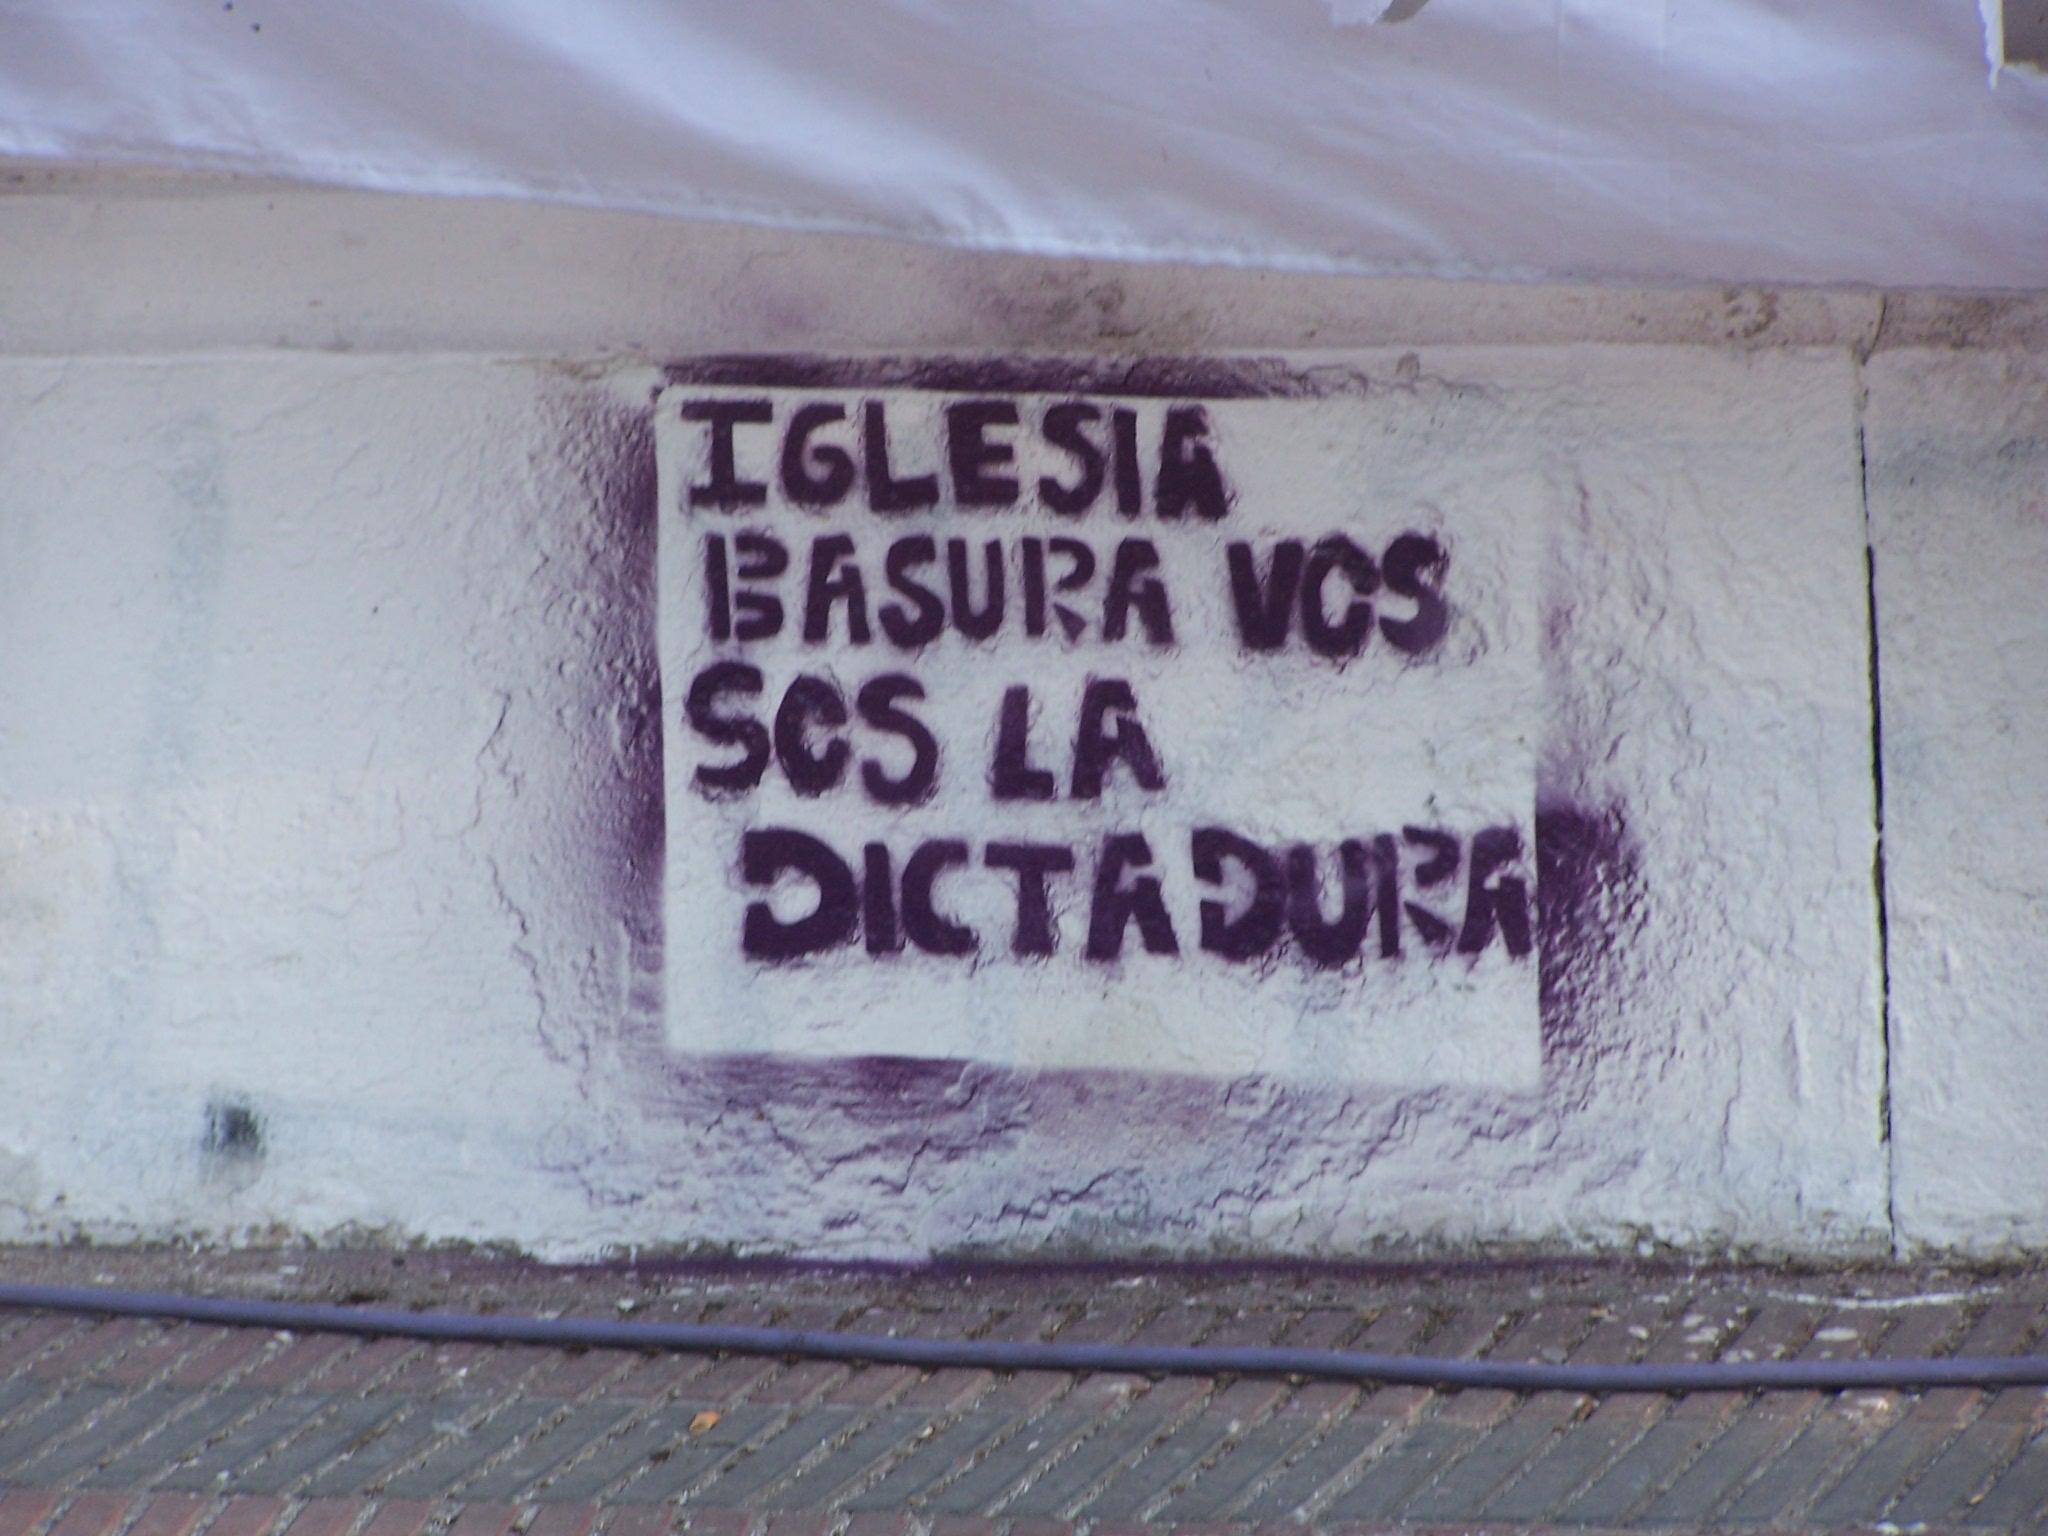 http://argentina.indymedia.org/uploads/2007/09/iglesia_basura.jpg